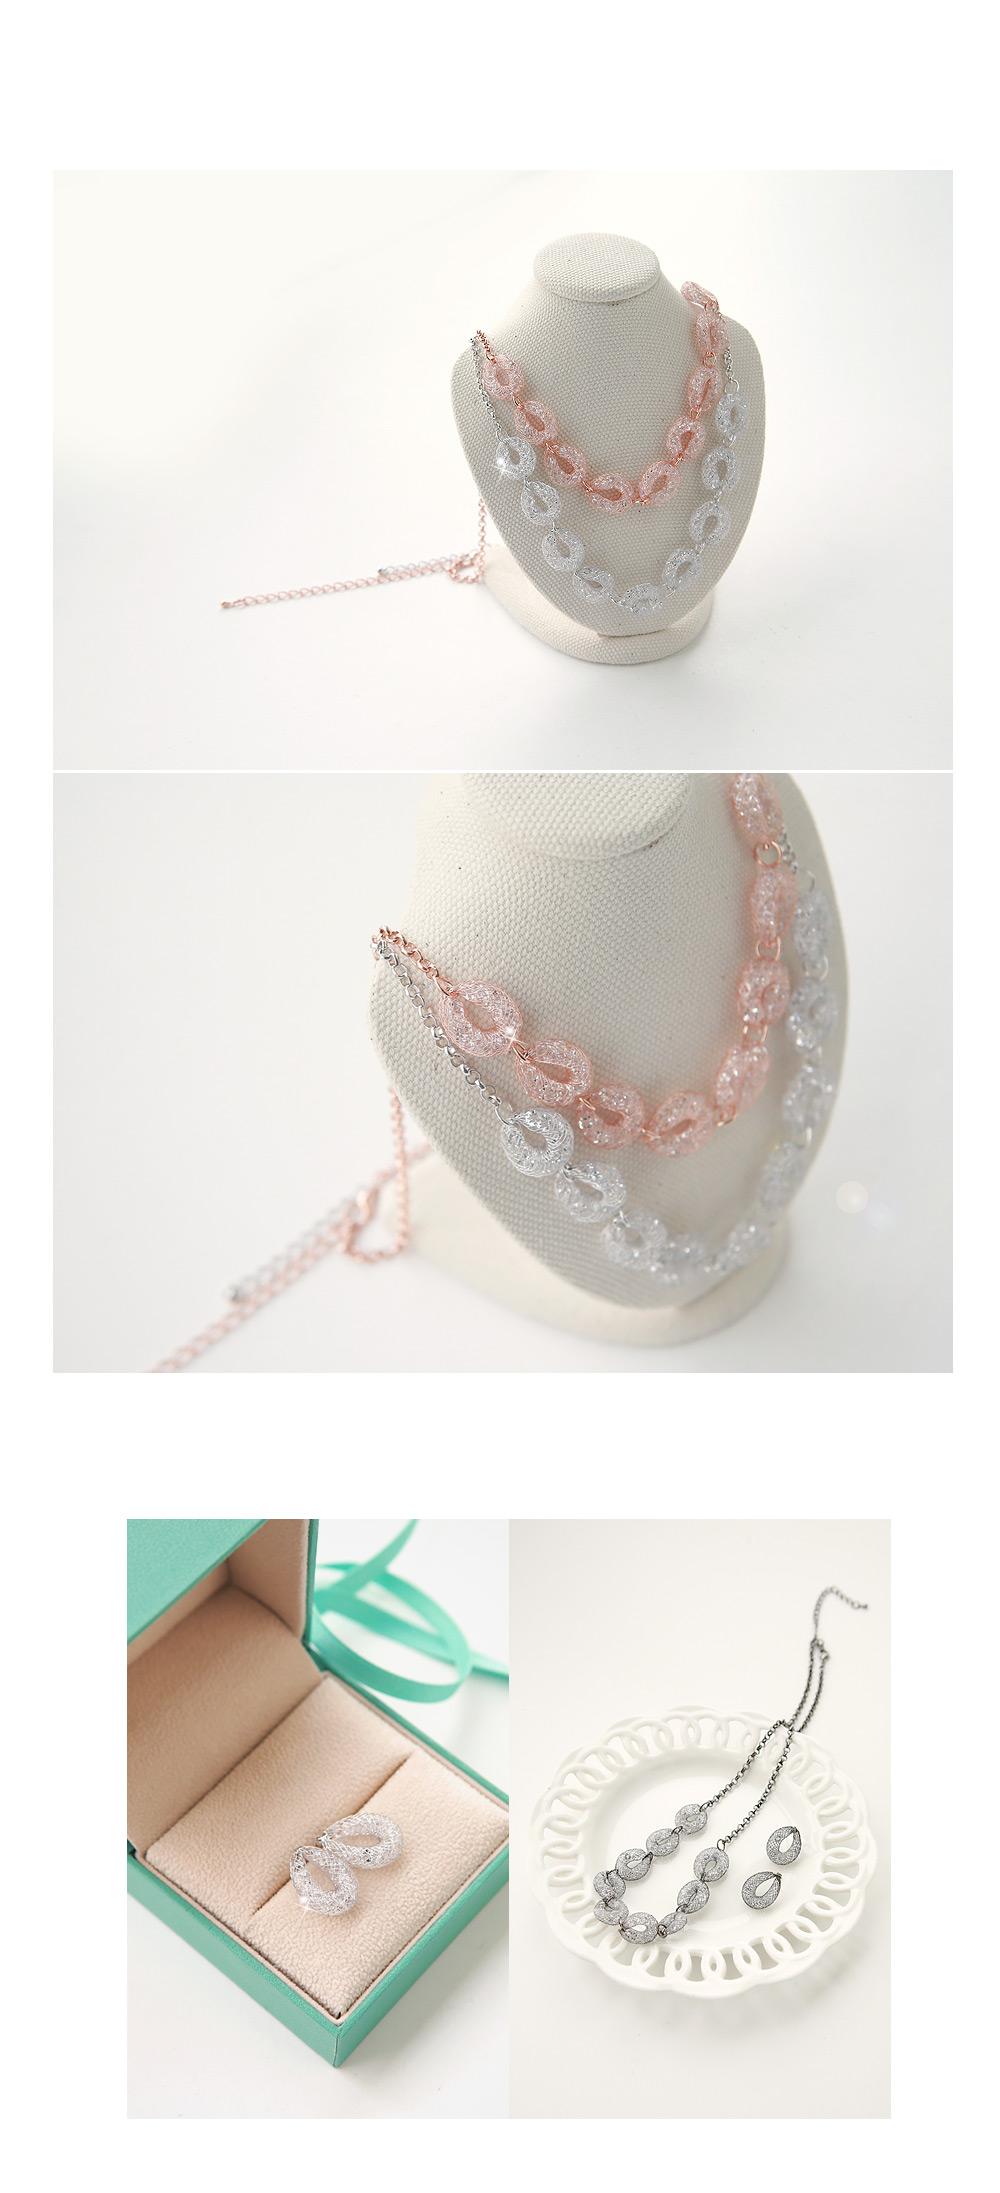 [ 4xtyle ] 网状撕裂项链、3种颜色